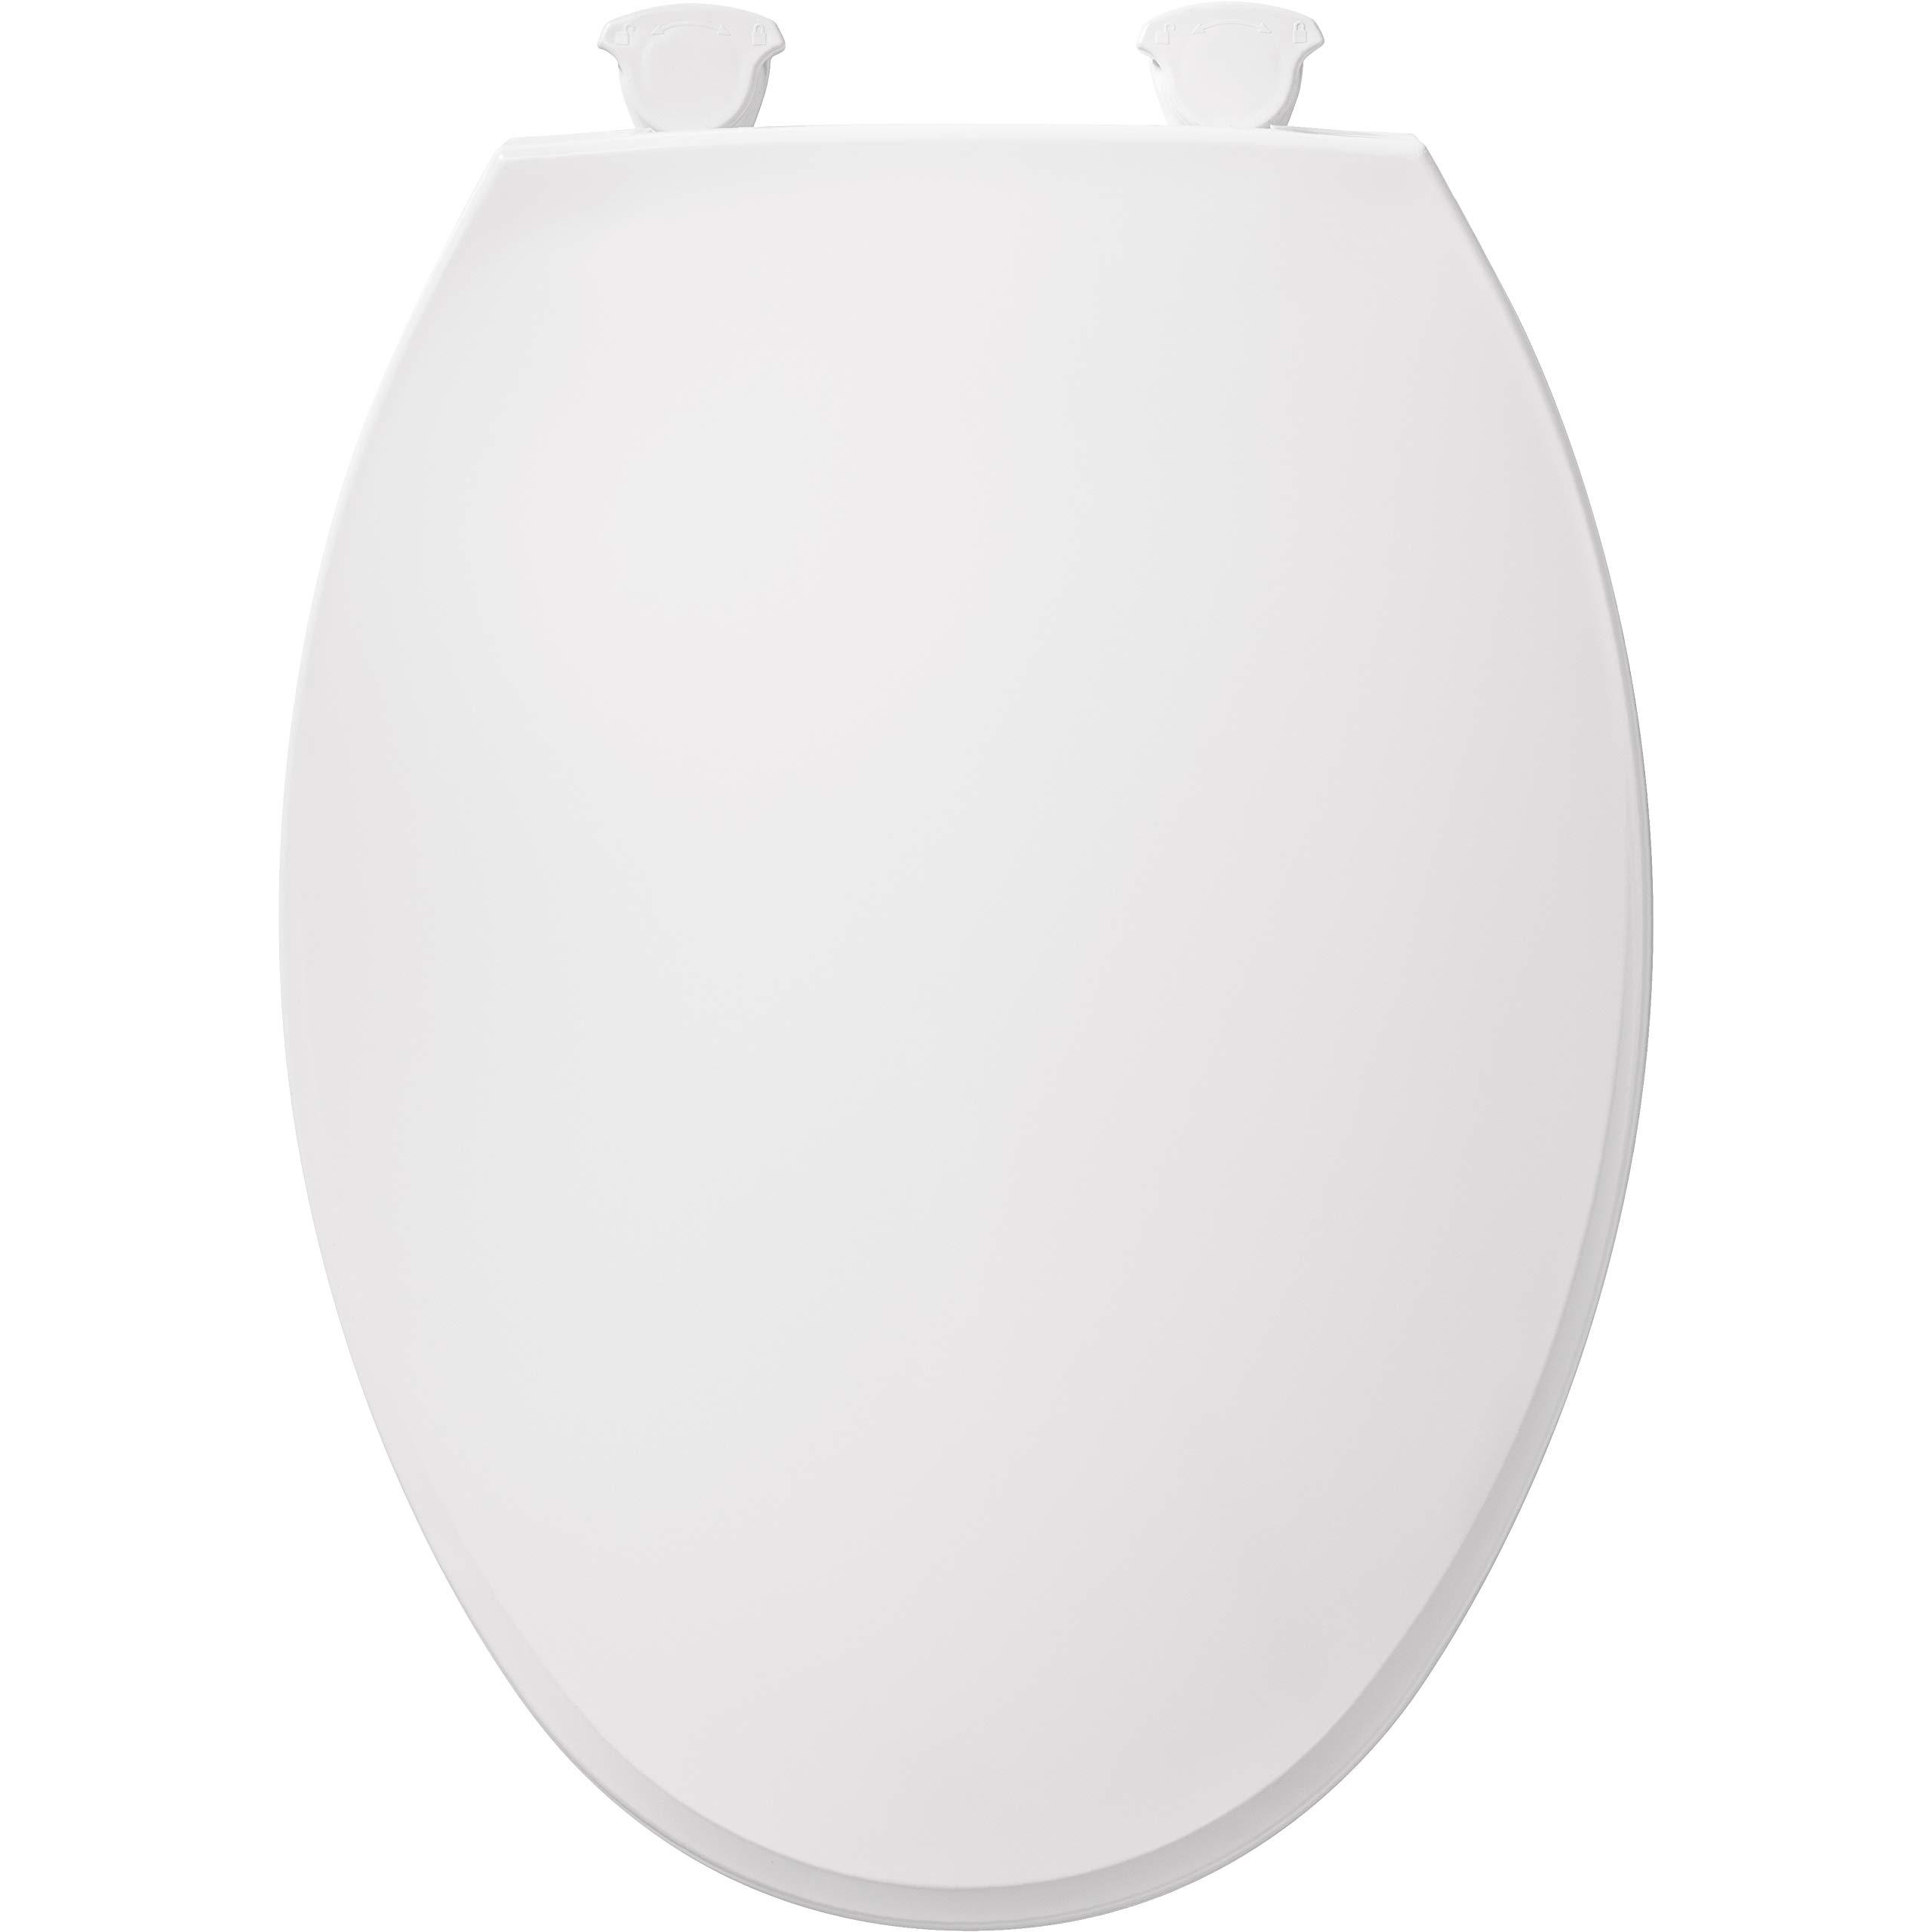 Bemis 1800EC 346 Plastic Elongated Toilet Seat with Easy Clean & Change Hinges Biscuit/Linen by Bemis (Image #1)